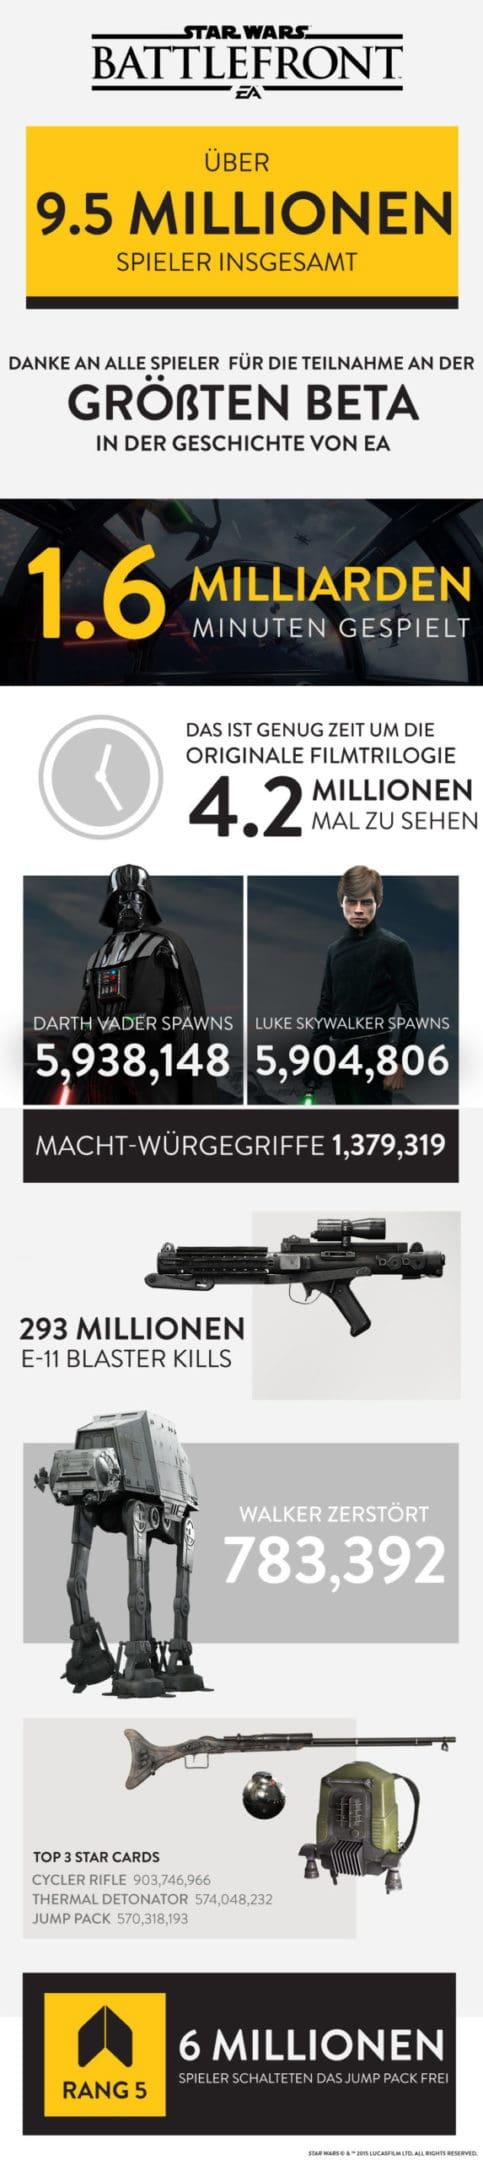 swbf_beta_infografik